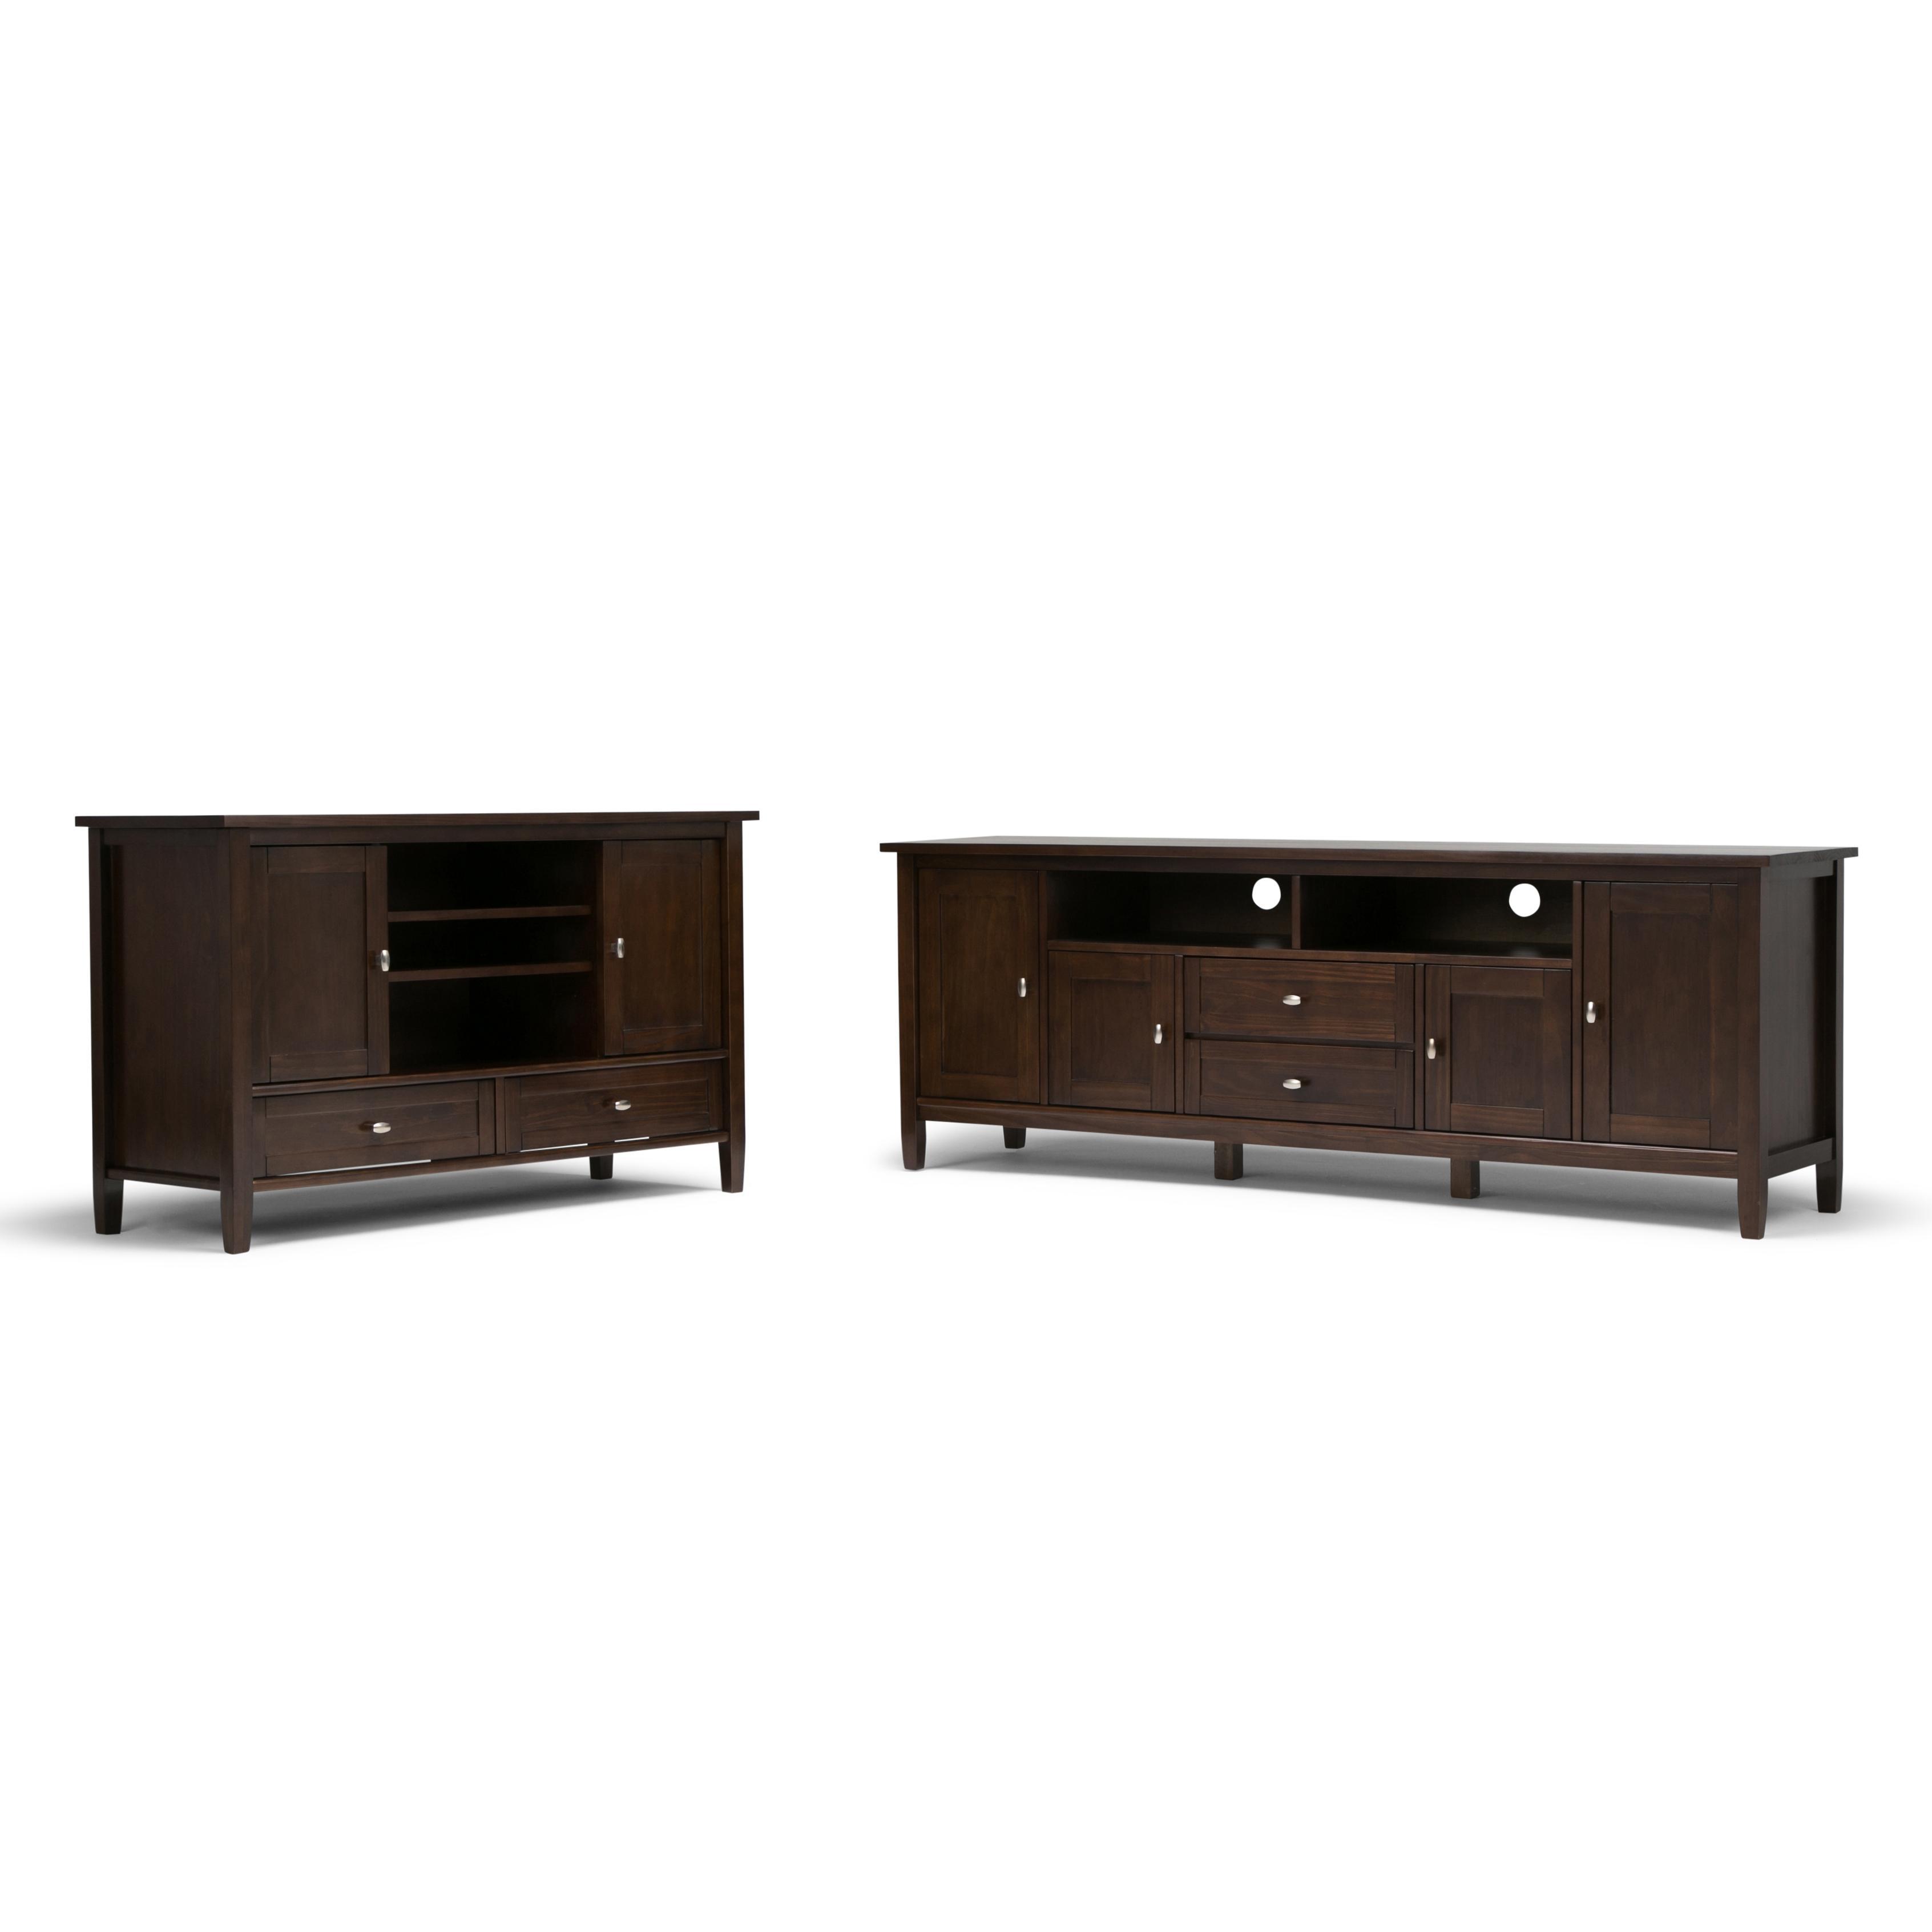 simpli home warm shaker 72 tv media stand tobacco brown kitchen dining. Black Bedroom Furniture Sets. Home Design Ideas